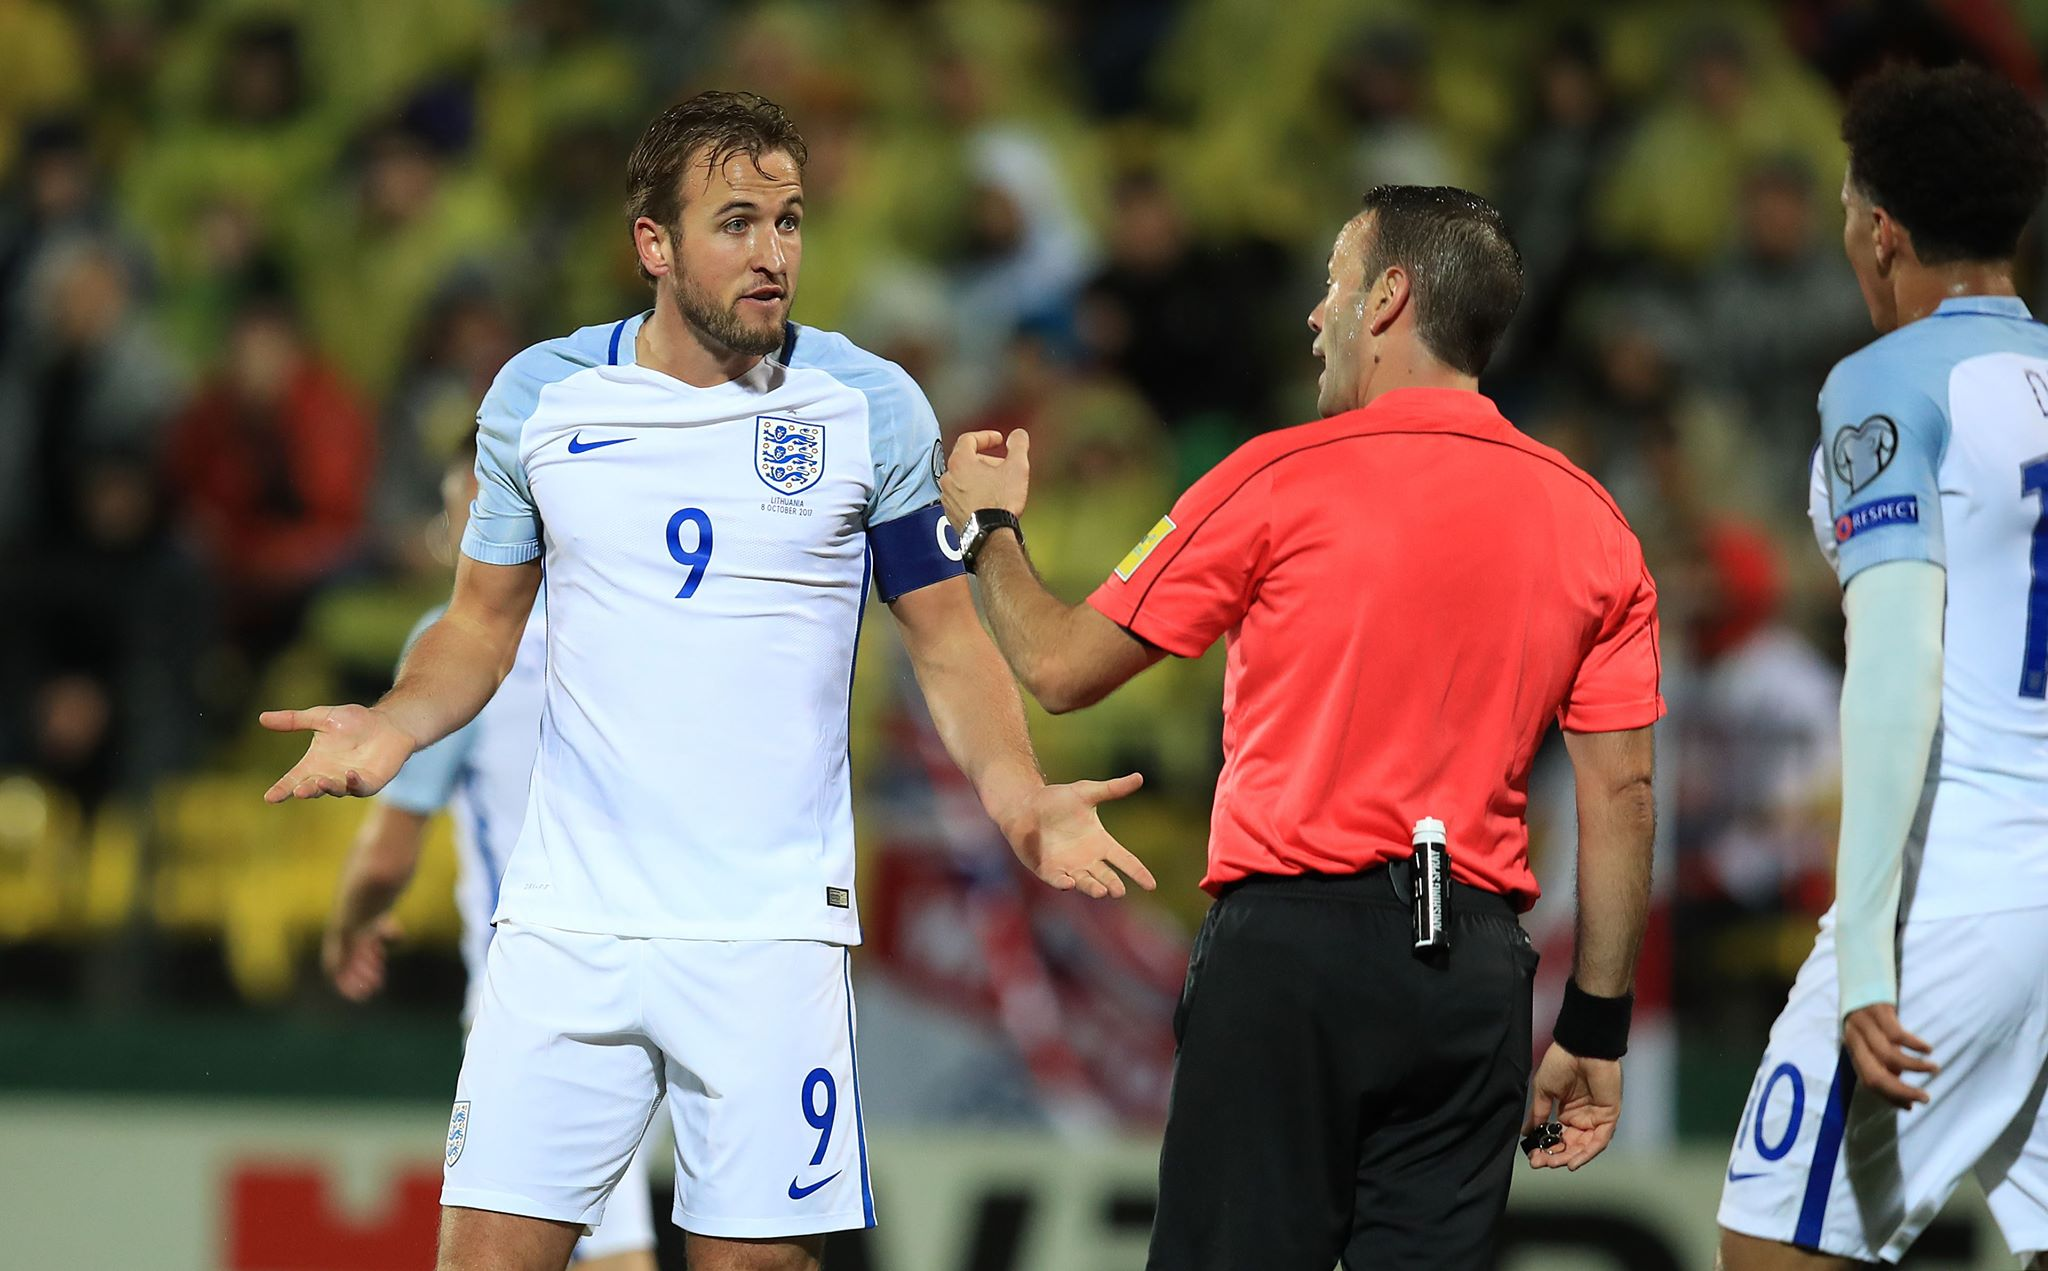 Kane donning the armband for England. Image: PA